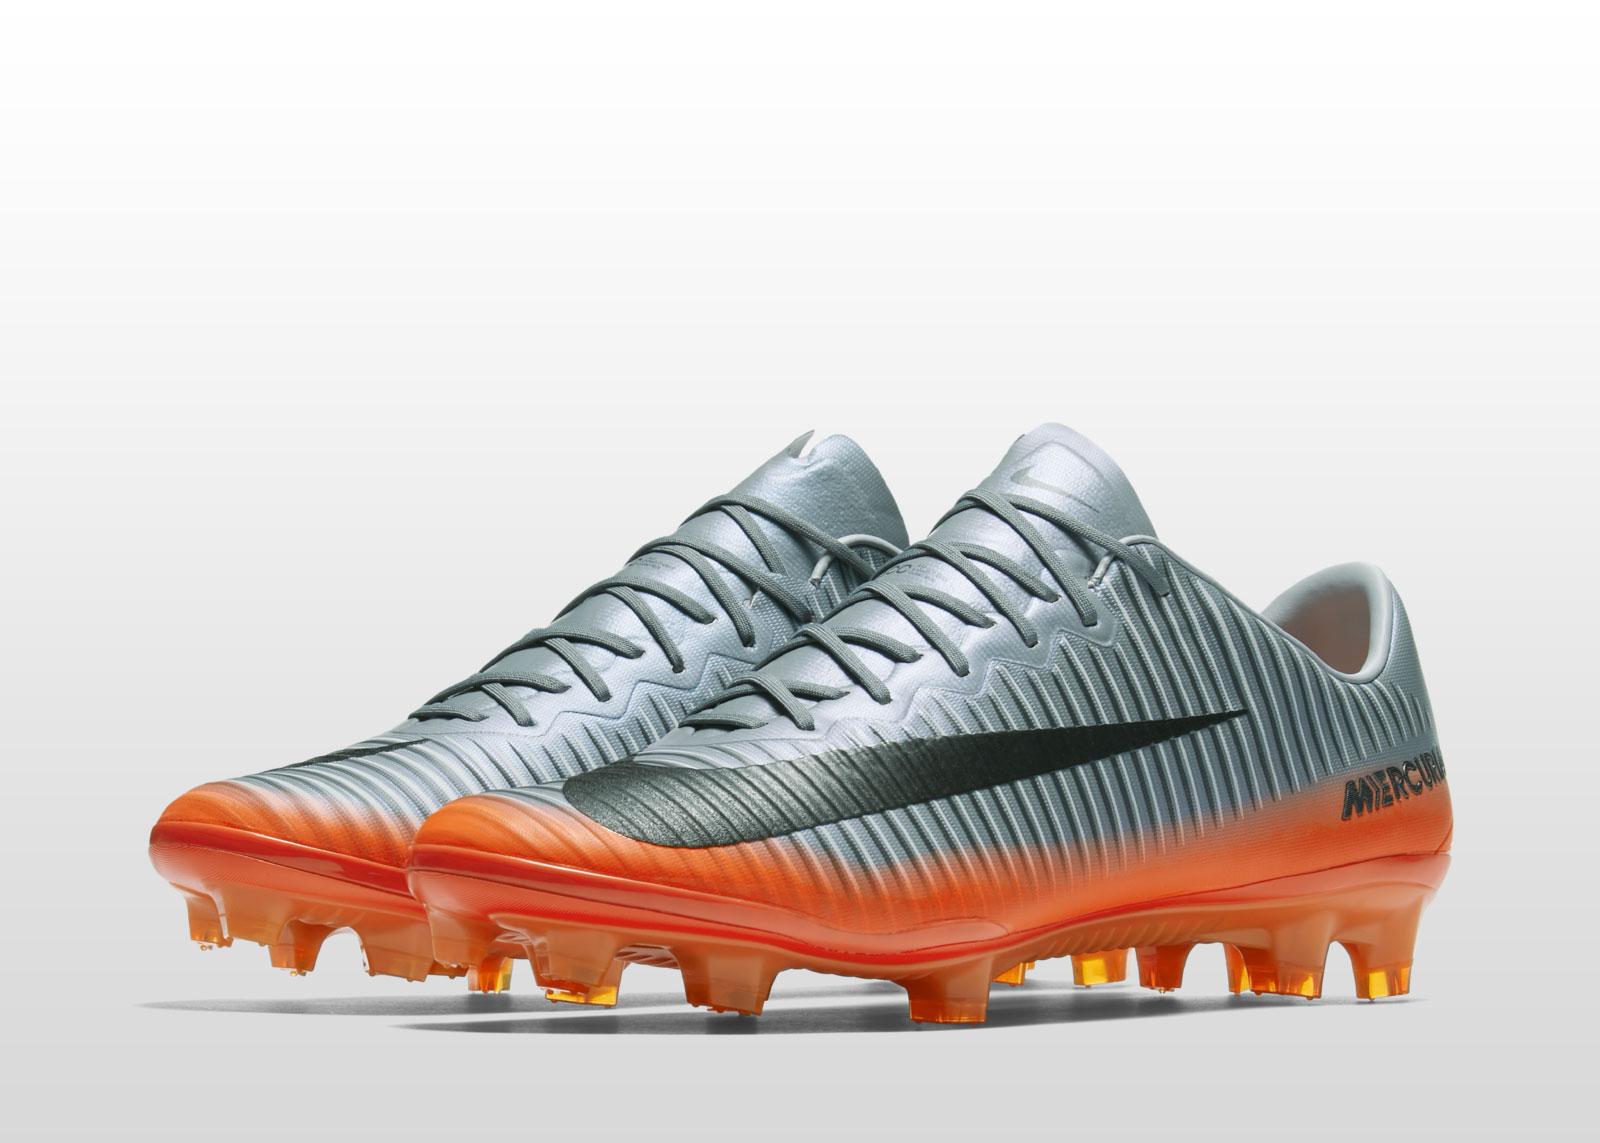 Nike Mercurial Vapor XI CR7 - 4